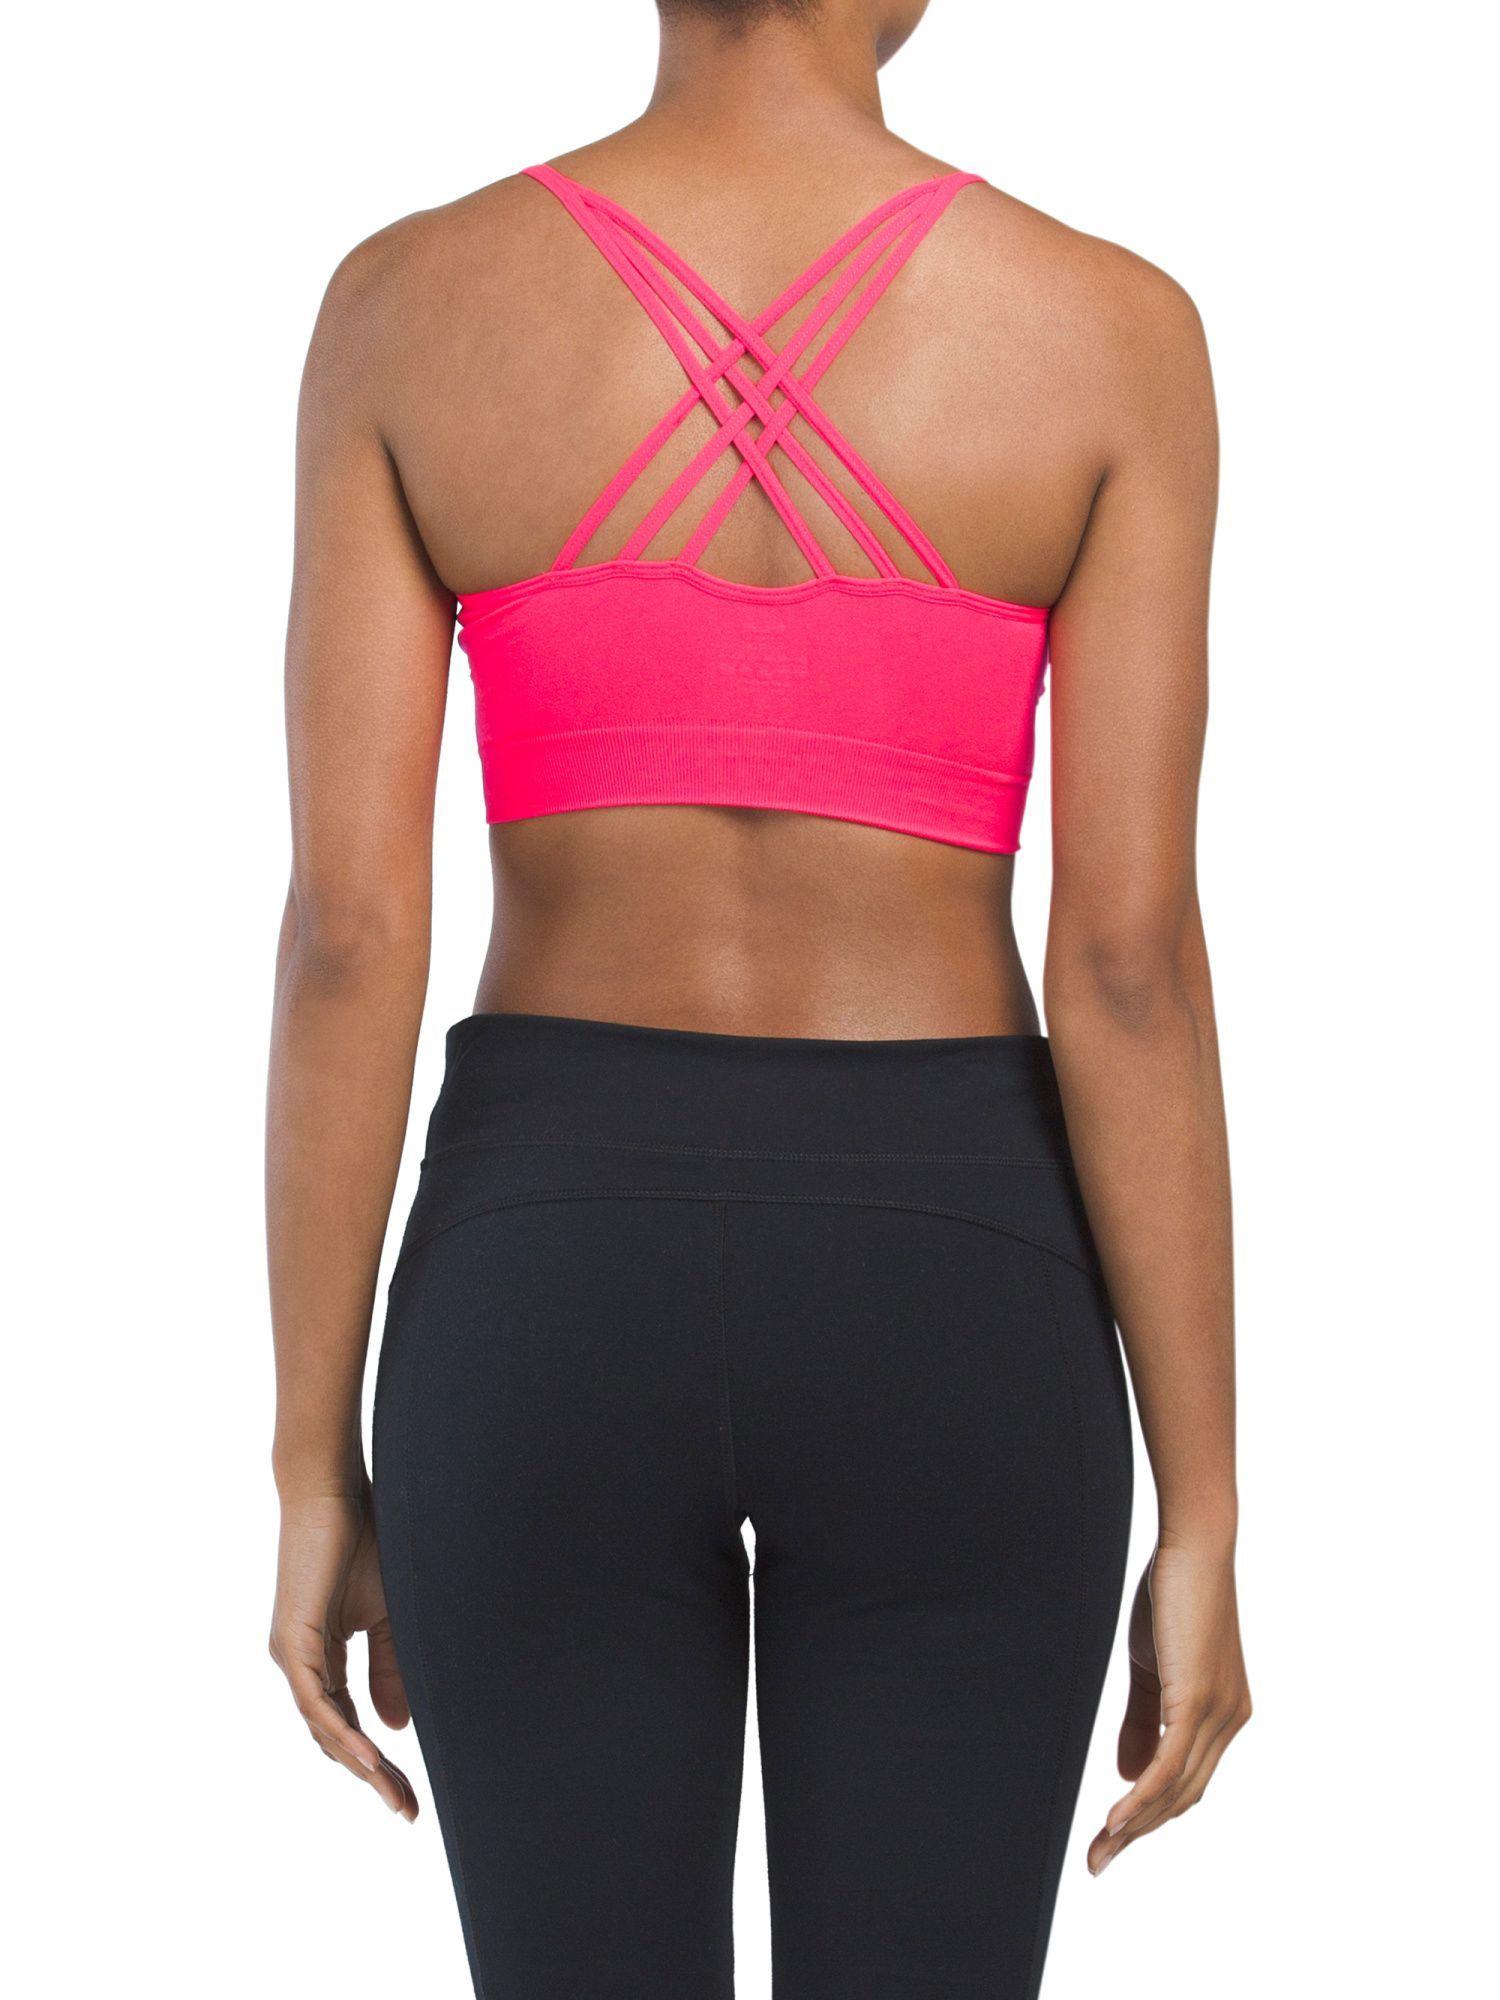 Multi Strap Short Bra Bra, Fashion, Fashion design